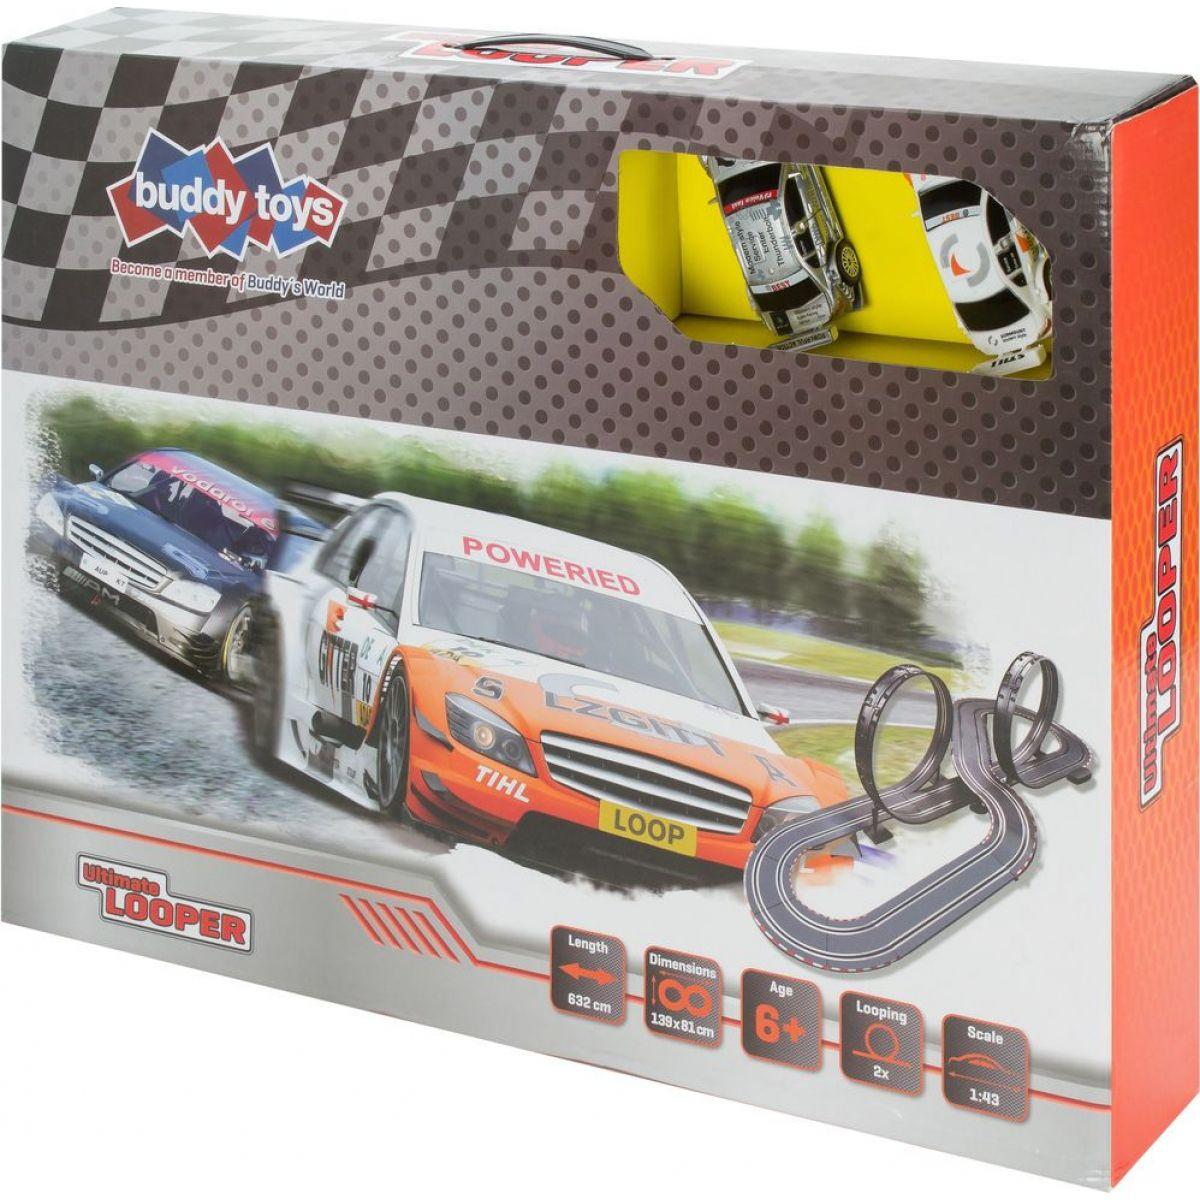 Buddy toys Autodráha Looper